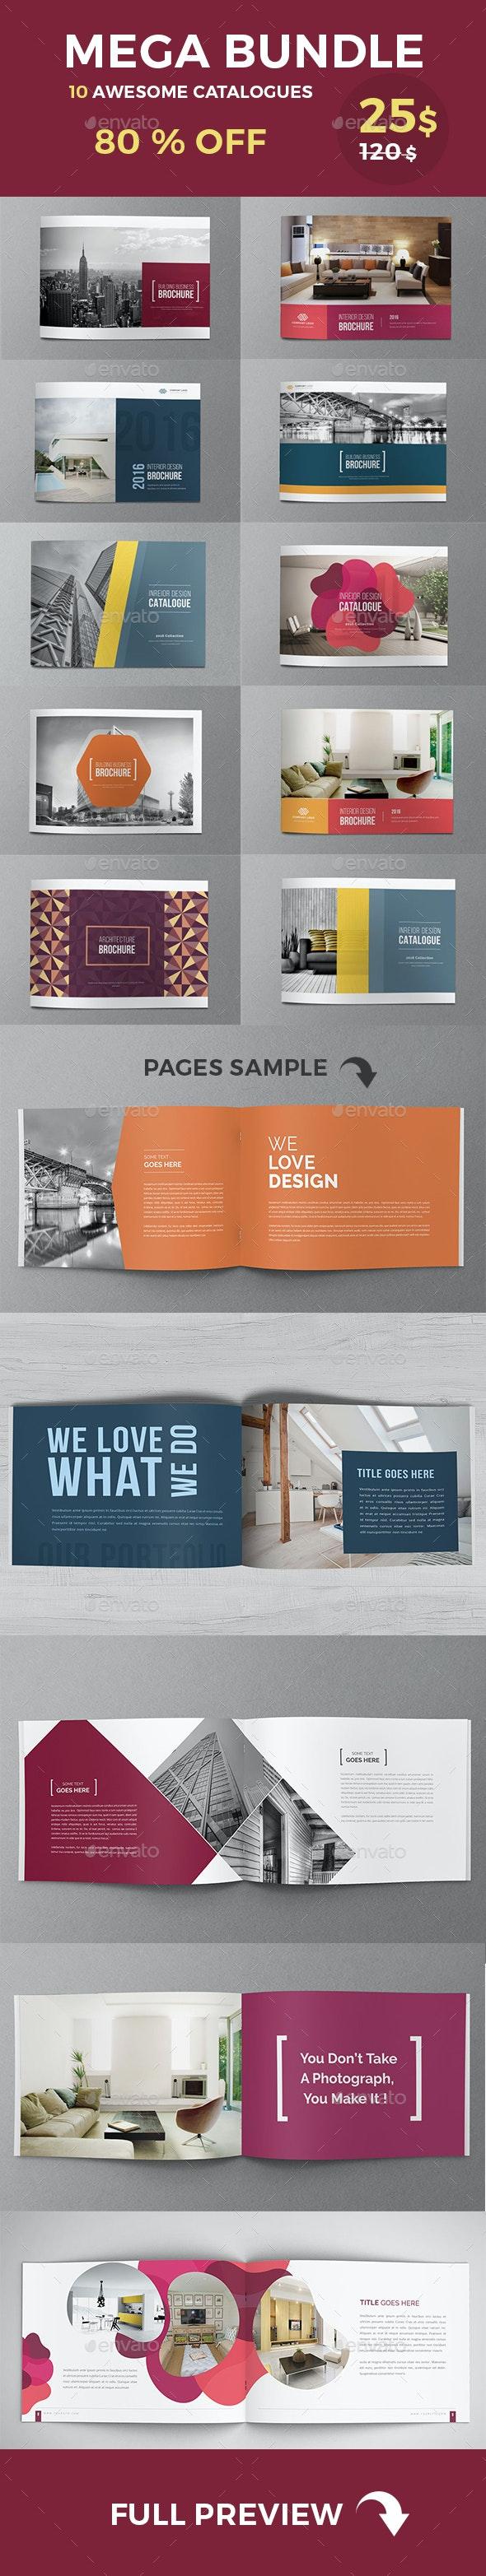 Mega Catalogs Brochures Bundle - Catalogs Brochures